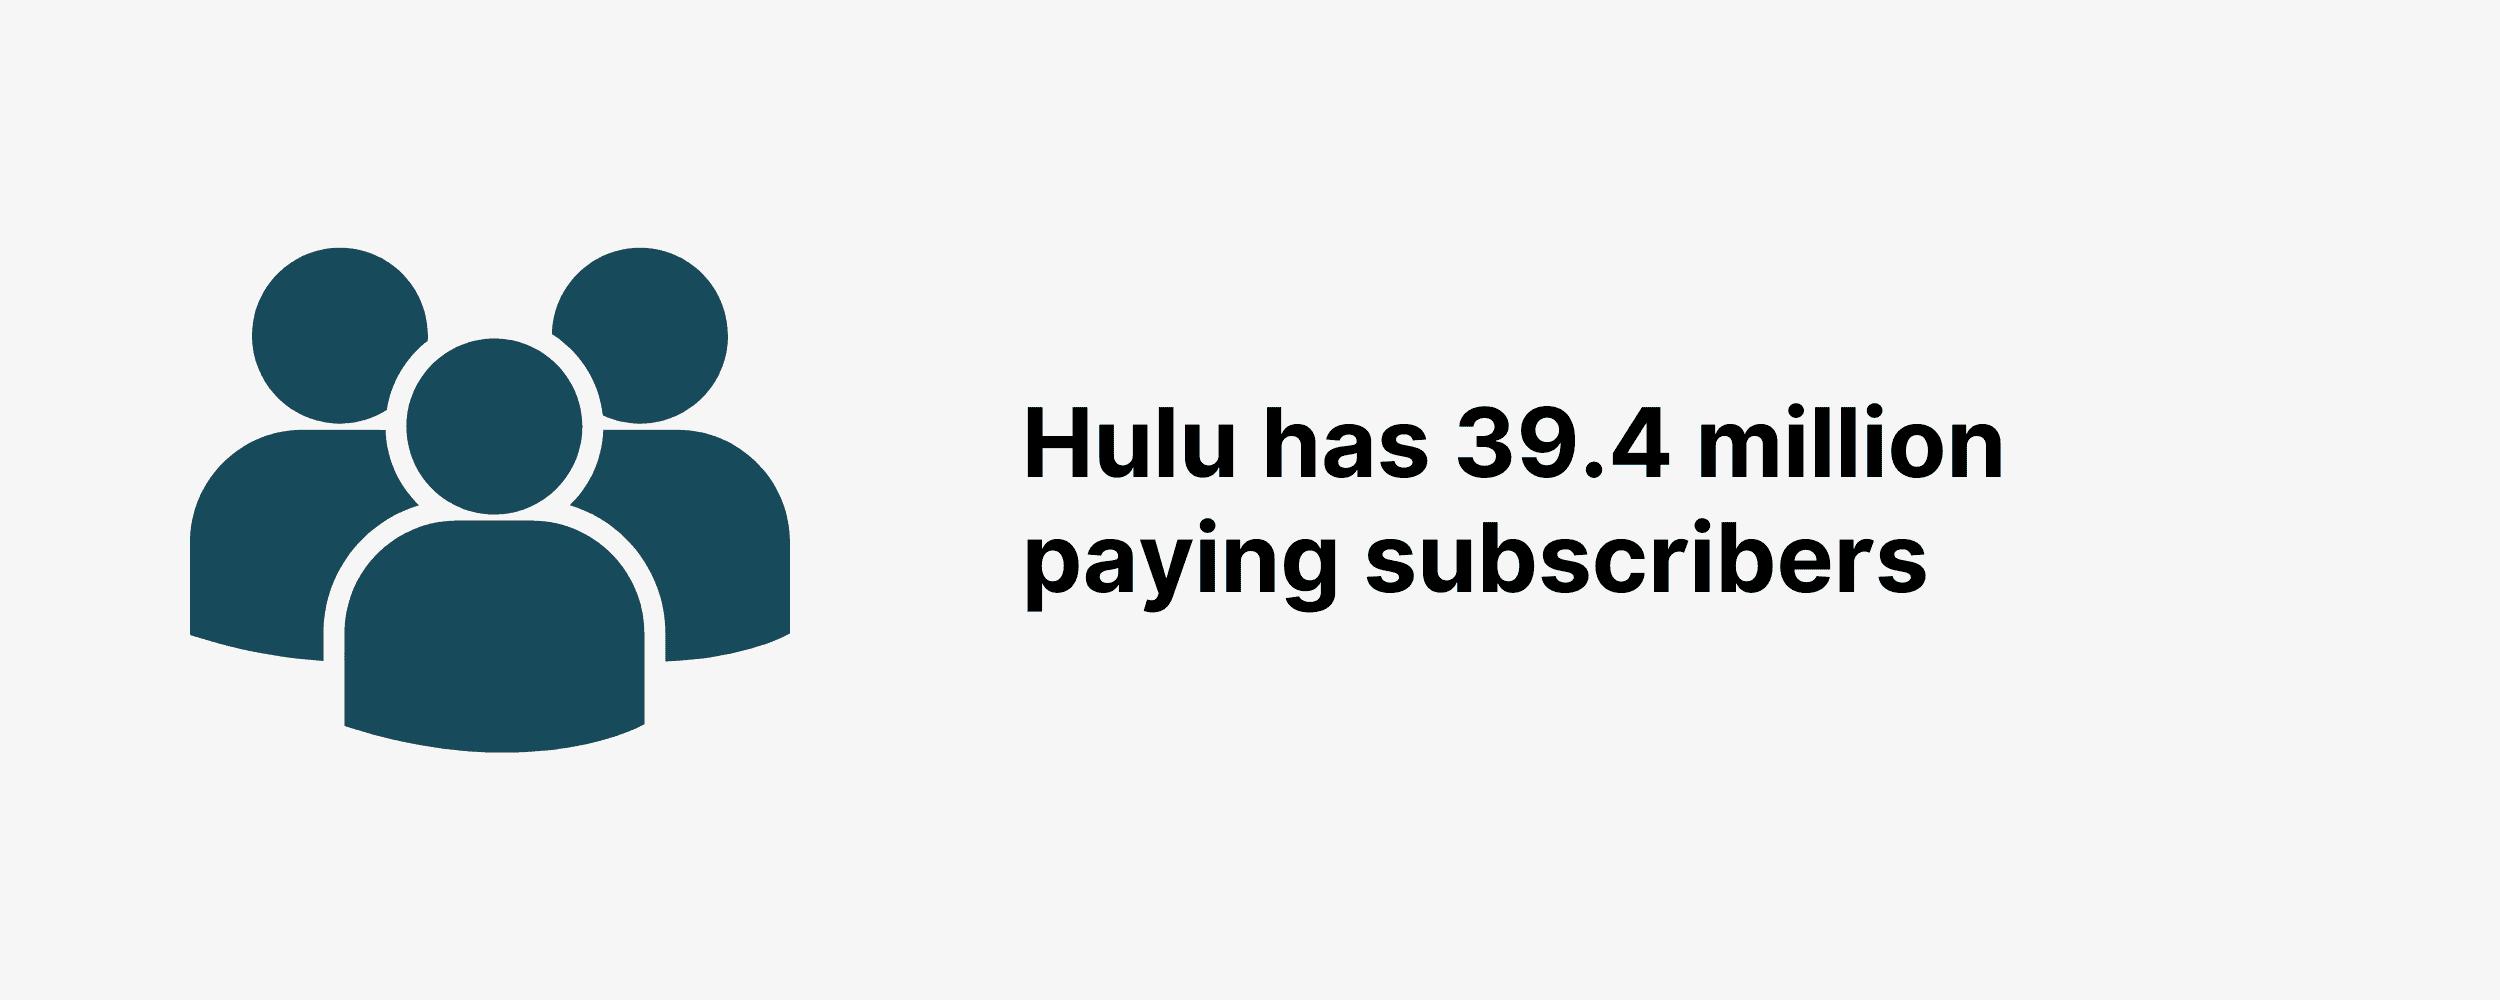 Hulu has 39.4 million paying subscribers